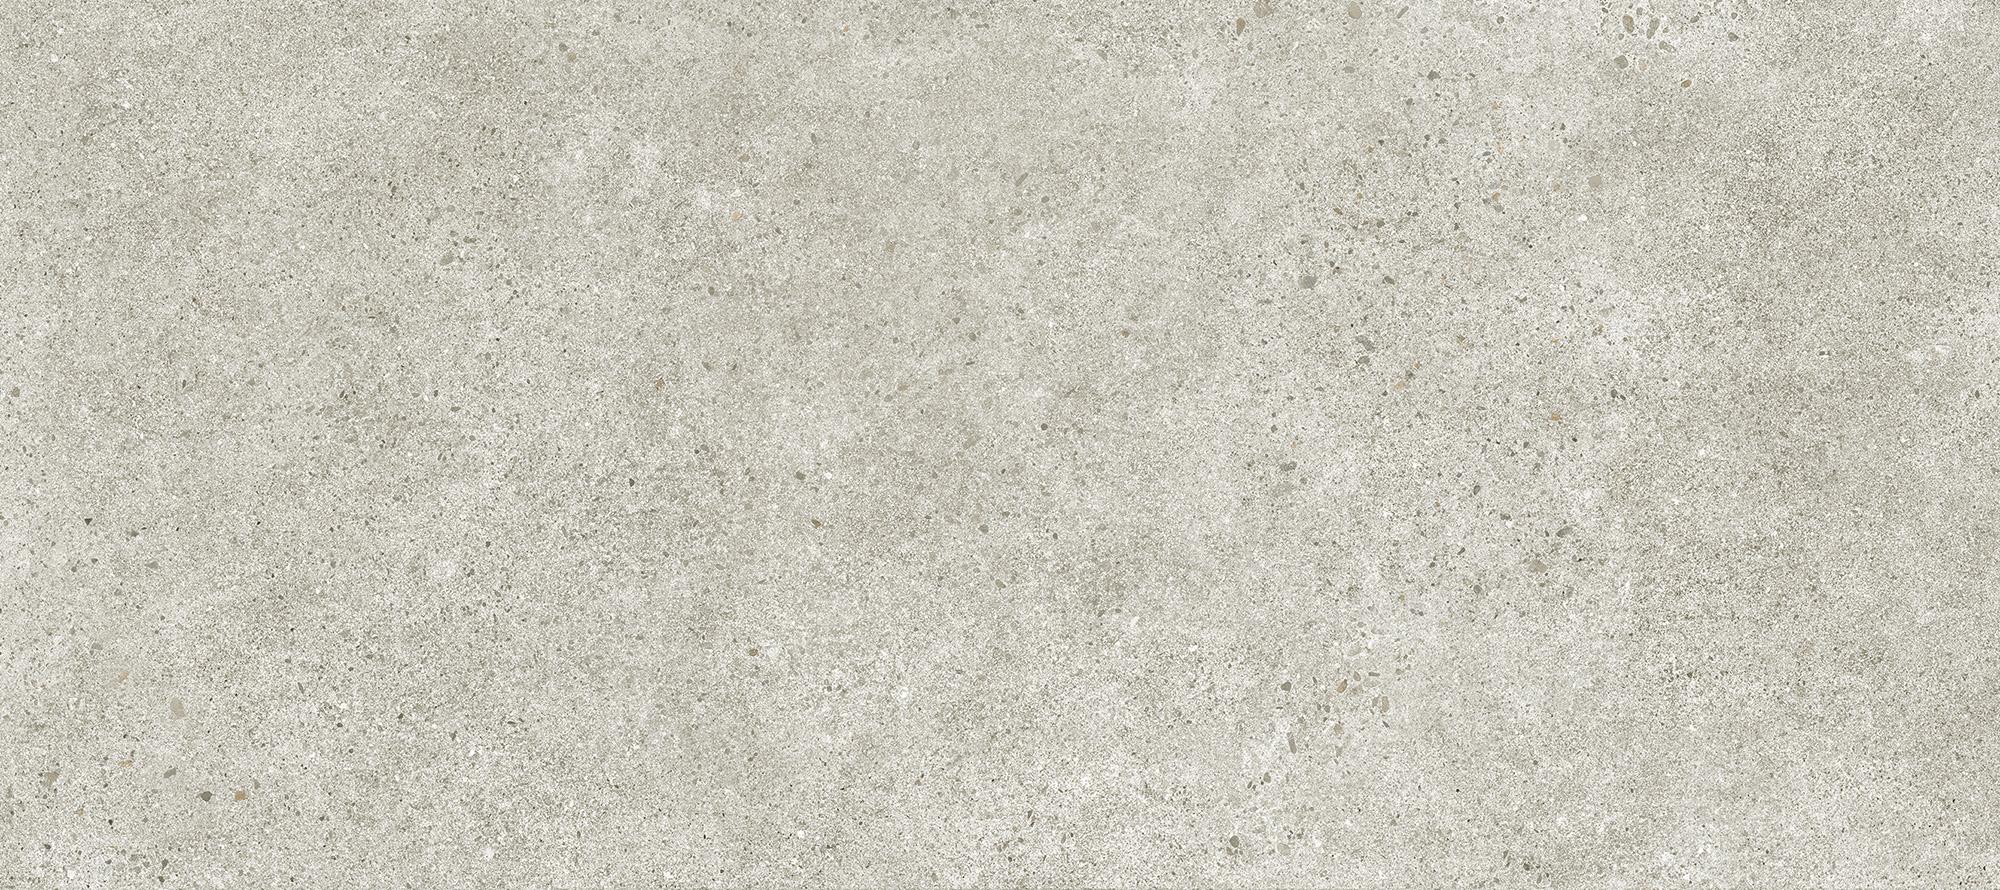 0099626, Deep, Vaaleanharmaa, lattia,pakkasenkesto,liukastumisenesto,uimahalli